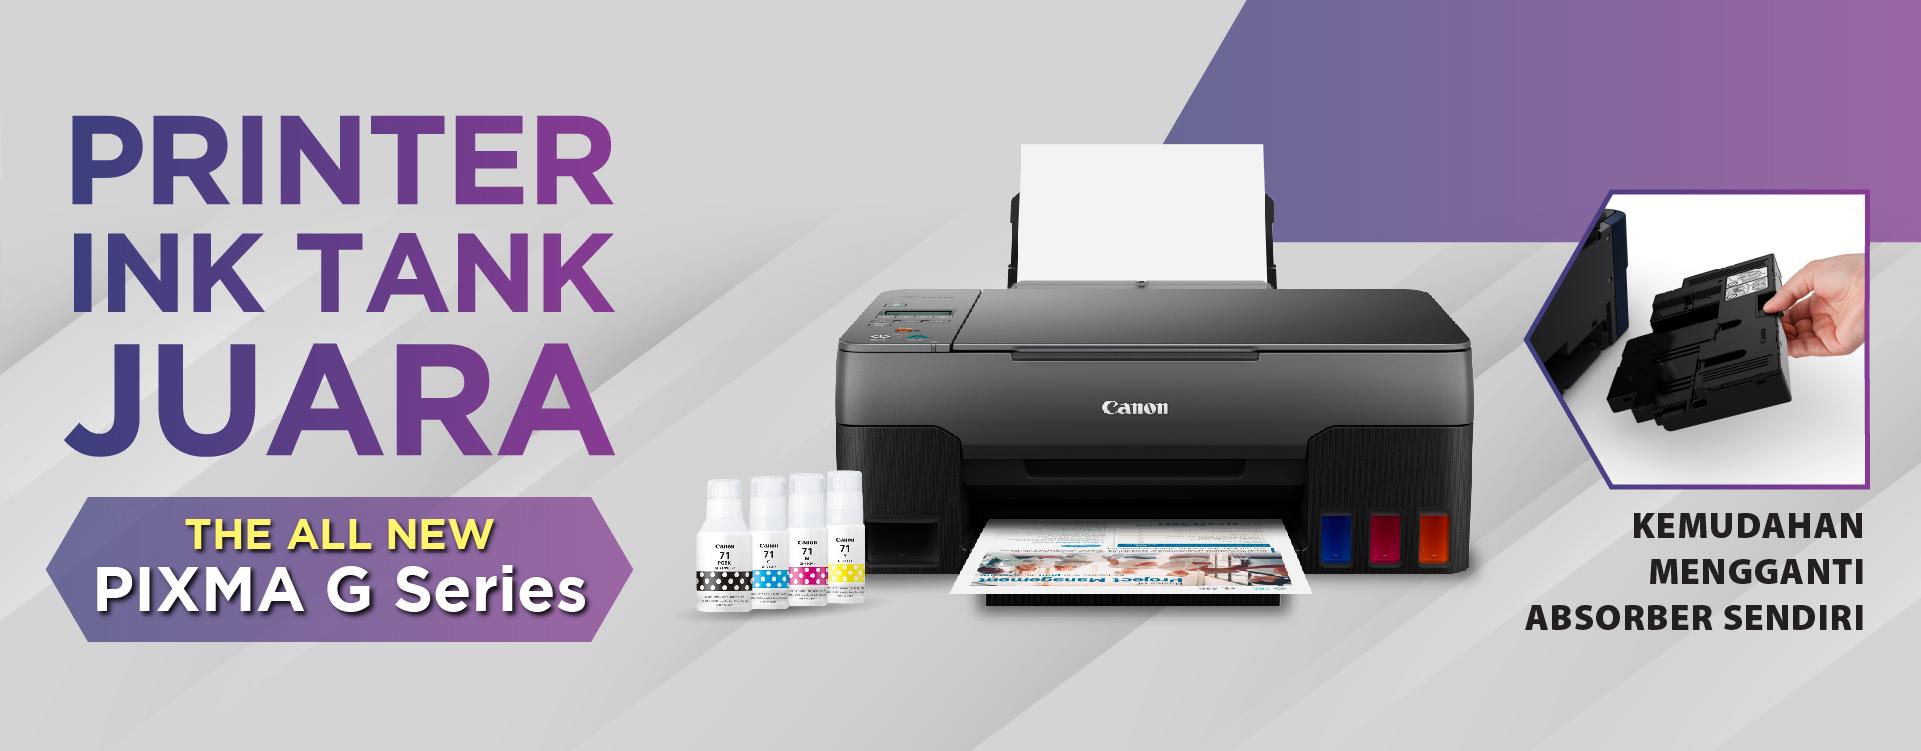 Printer Ink Tank Juara Banner